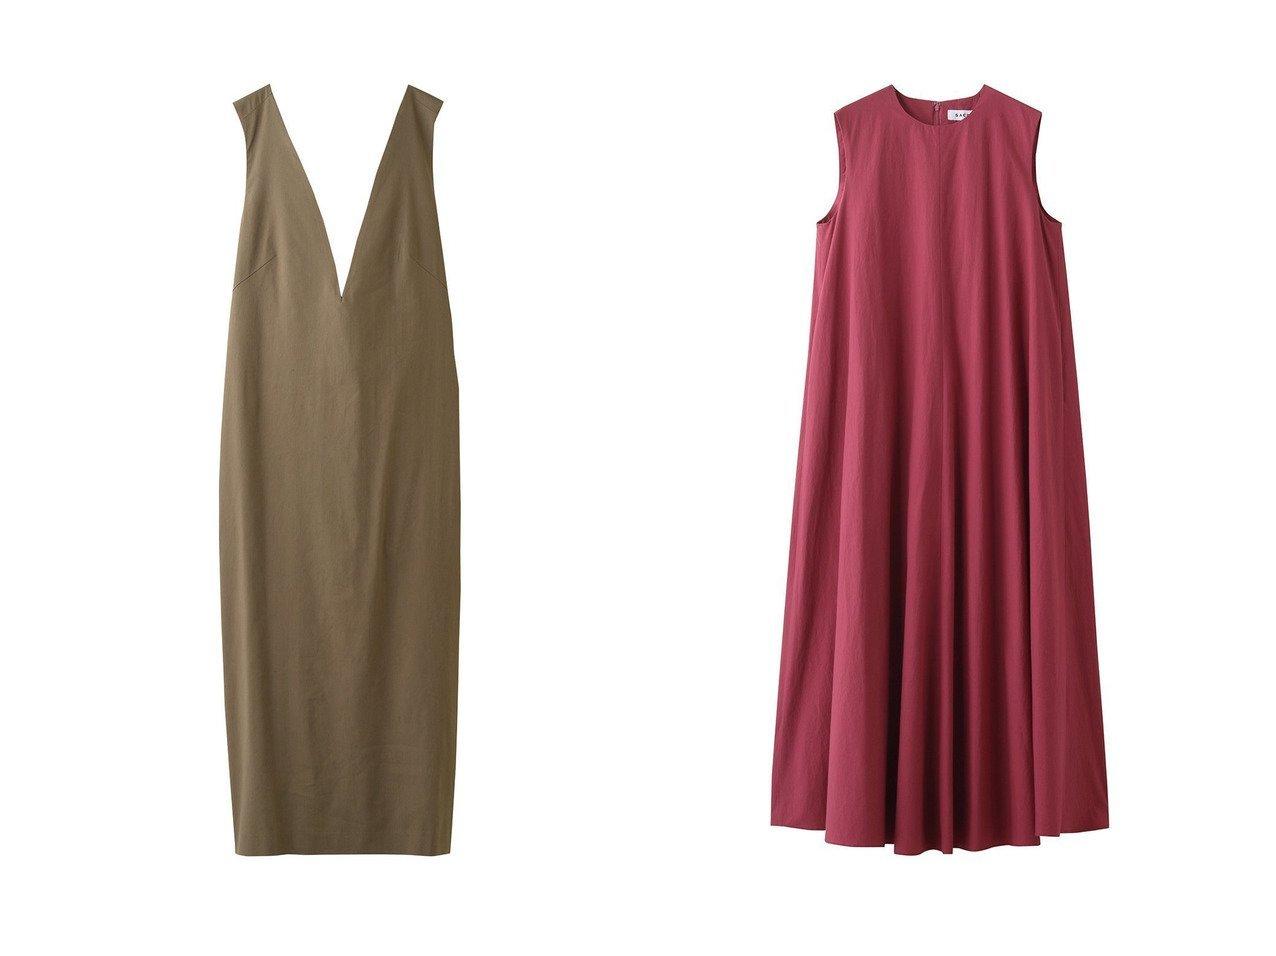 【SACRA/サクラ】のビスコースリネンワンピース&リプルタイプライターワンピース 【ワンピース・ドレス】おすすめ!人気、トレンド・レディースファッションの通販 おすすめで人気の流行・トレンド、ファッションの通販商品 メンズファッション・キッズファッション・インテリア・家具・レディースファッション・服の通販 founy(ファニー) https://founy.com/ ファッション Fashion レディースファッション WOMEN ワンピース Dress ロング S/S・春夏 SS・Spring/Summer シンプル フレア ワッシャー 春 Spring  ID:crp329100000035548